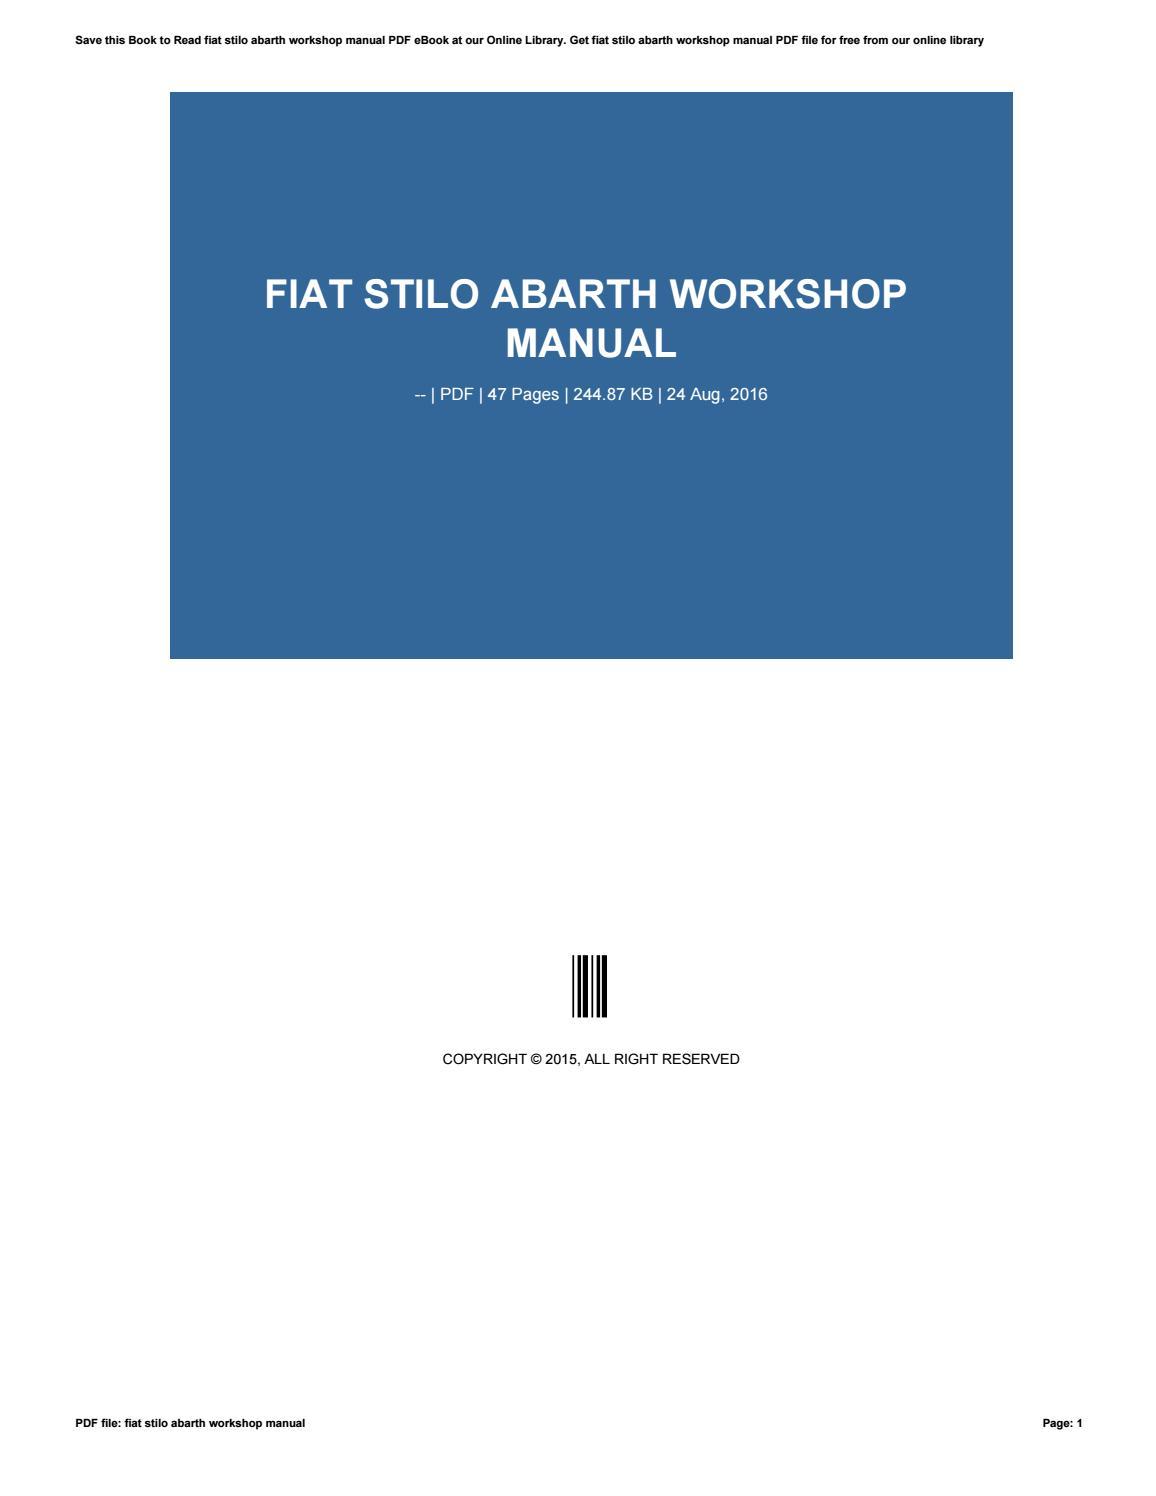 Fiat Stilo to buy near you in Portugal. Sale of Fiat Stilo ...